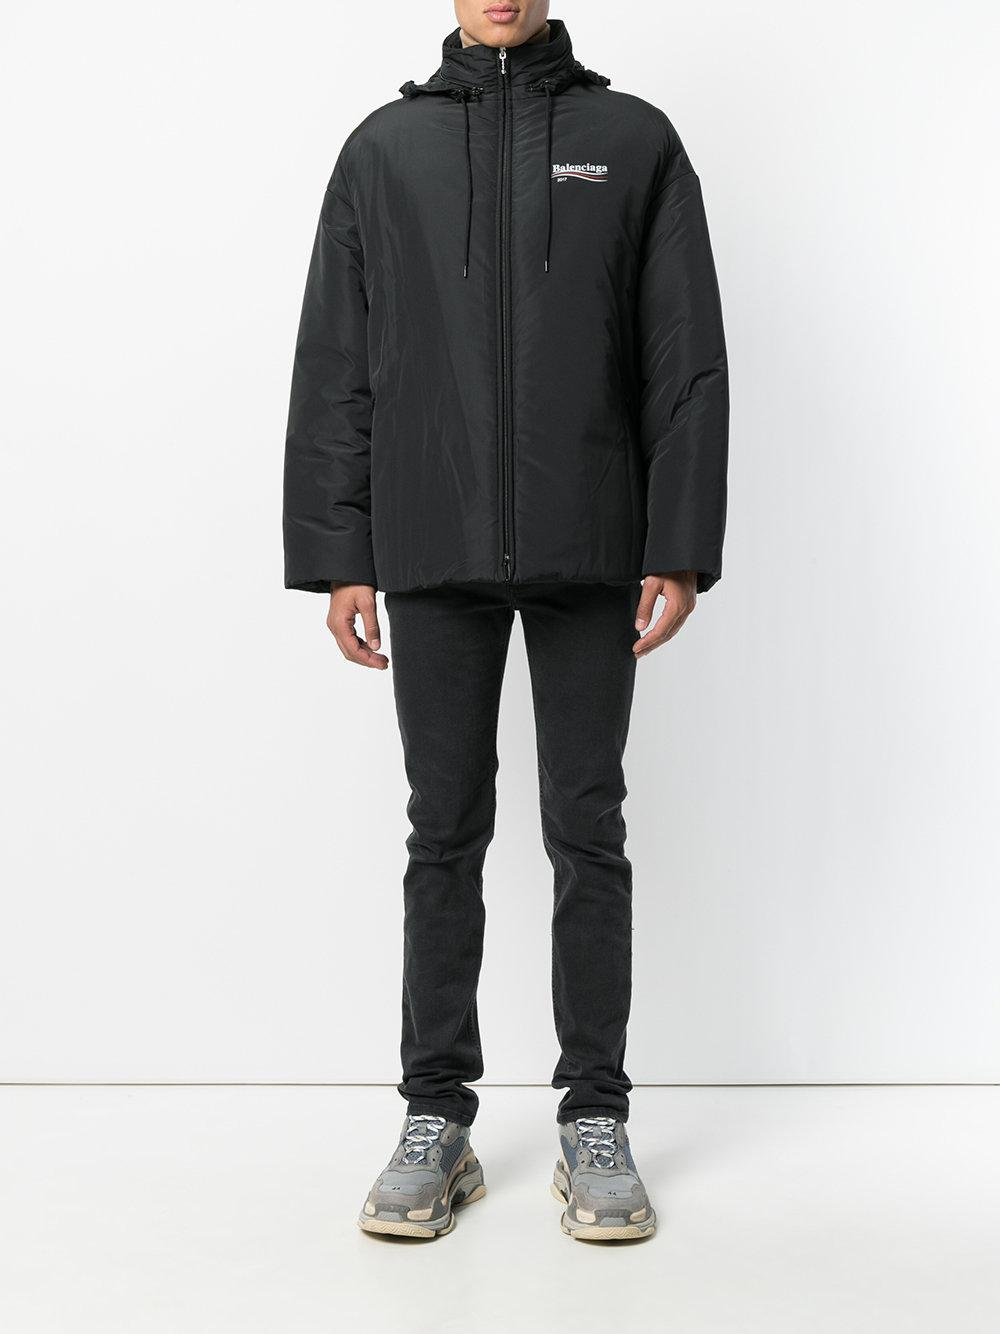 Balenciaga 2017 Padded Jacket in Black for Men - Lyst 178b083058c